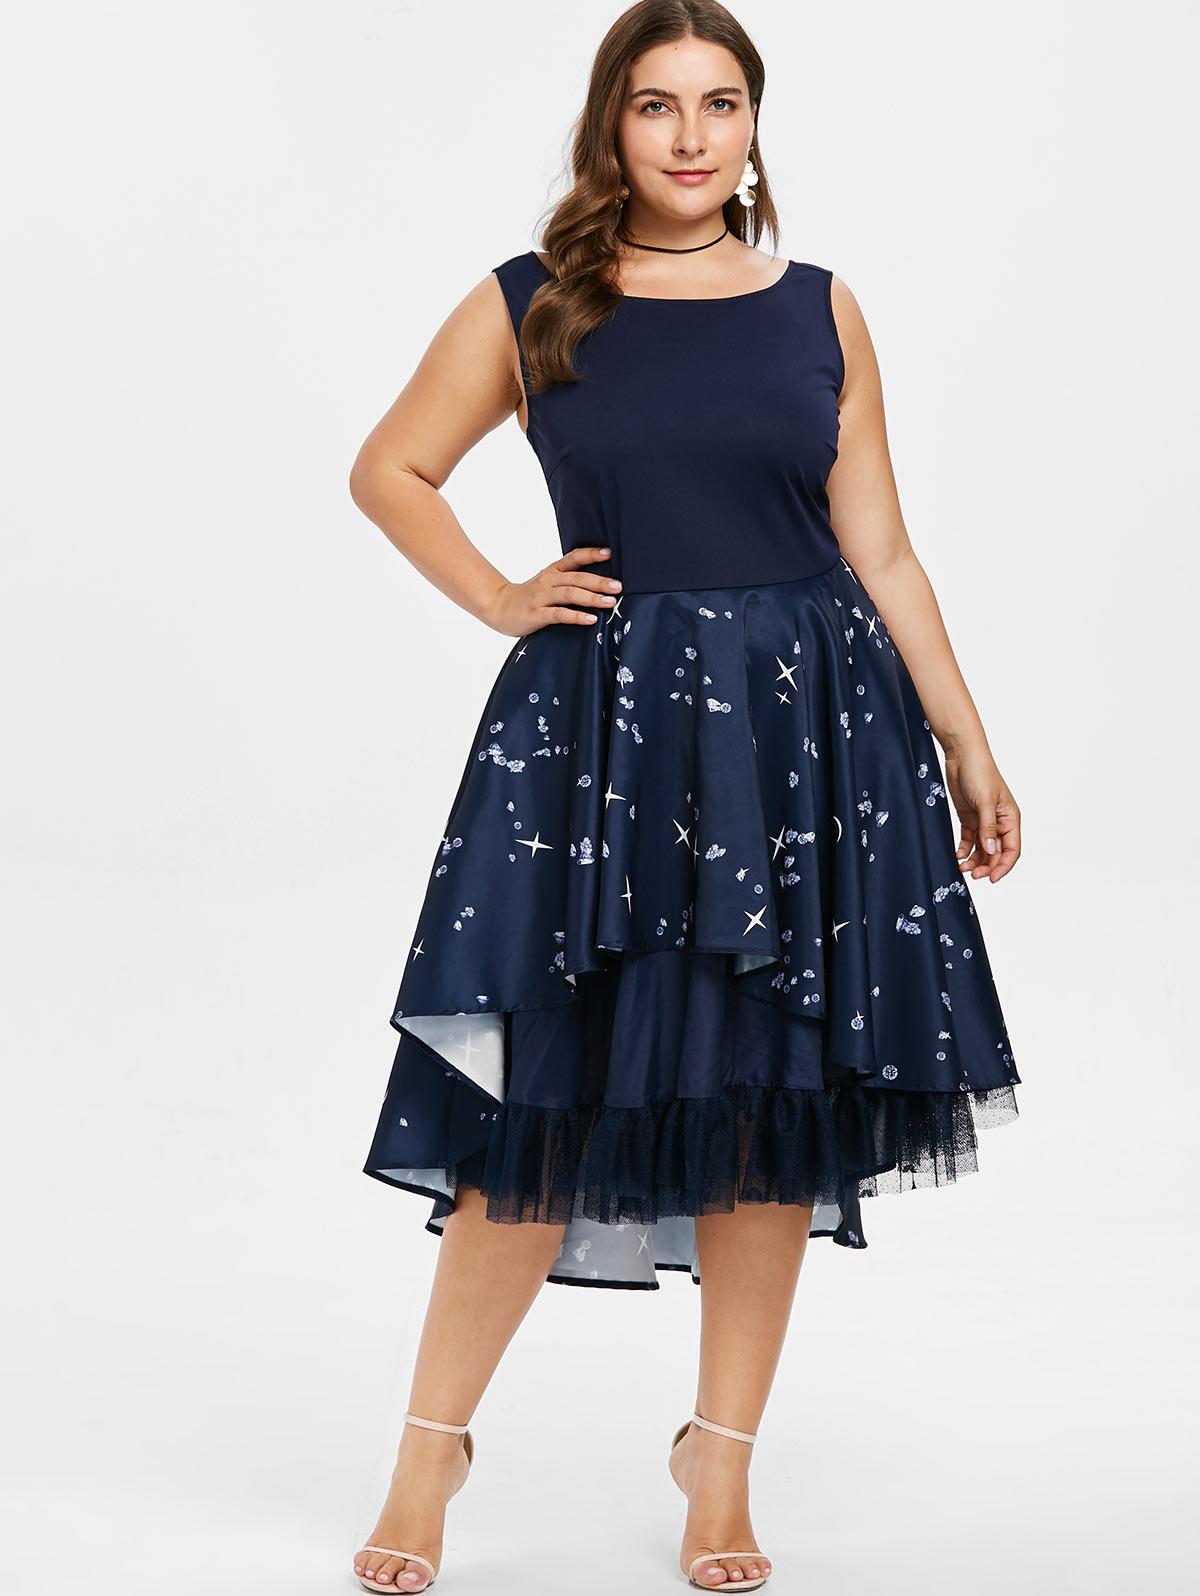 c0dea1545947c CosMera Plus Size Ruffle Rhinestone Pattern Retro Midi Dress Women Vintage  Round Neck Sleeveless Summer Dress Tunic Party Dress